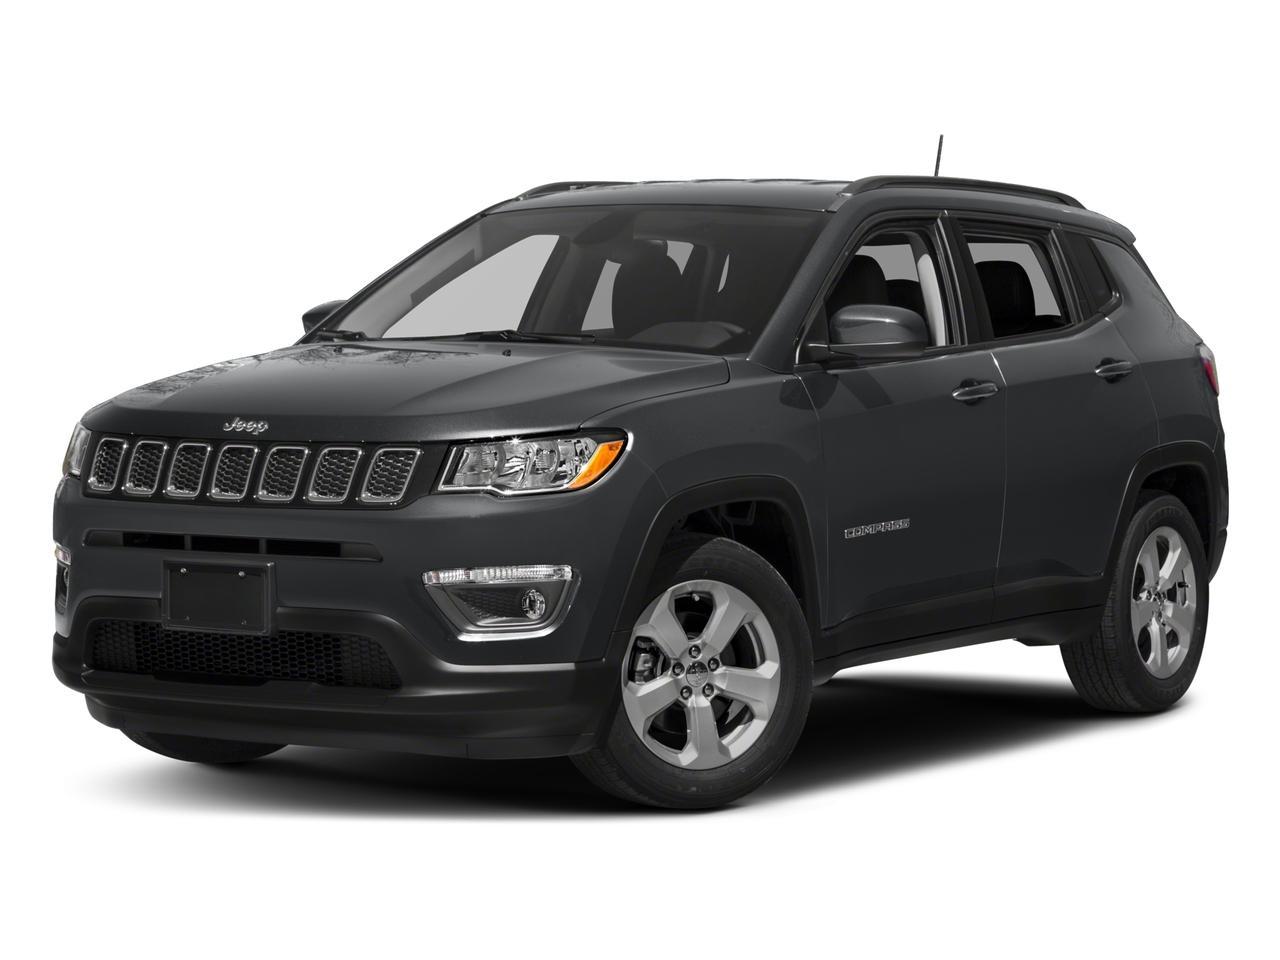 2017 Jeep Compass Vehicle Photo in CHAMPLAIN, NY 12919-0000